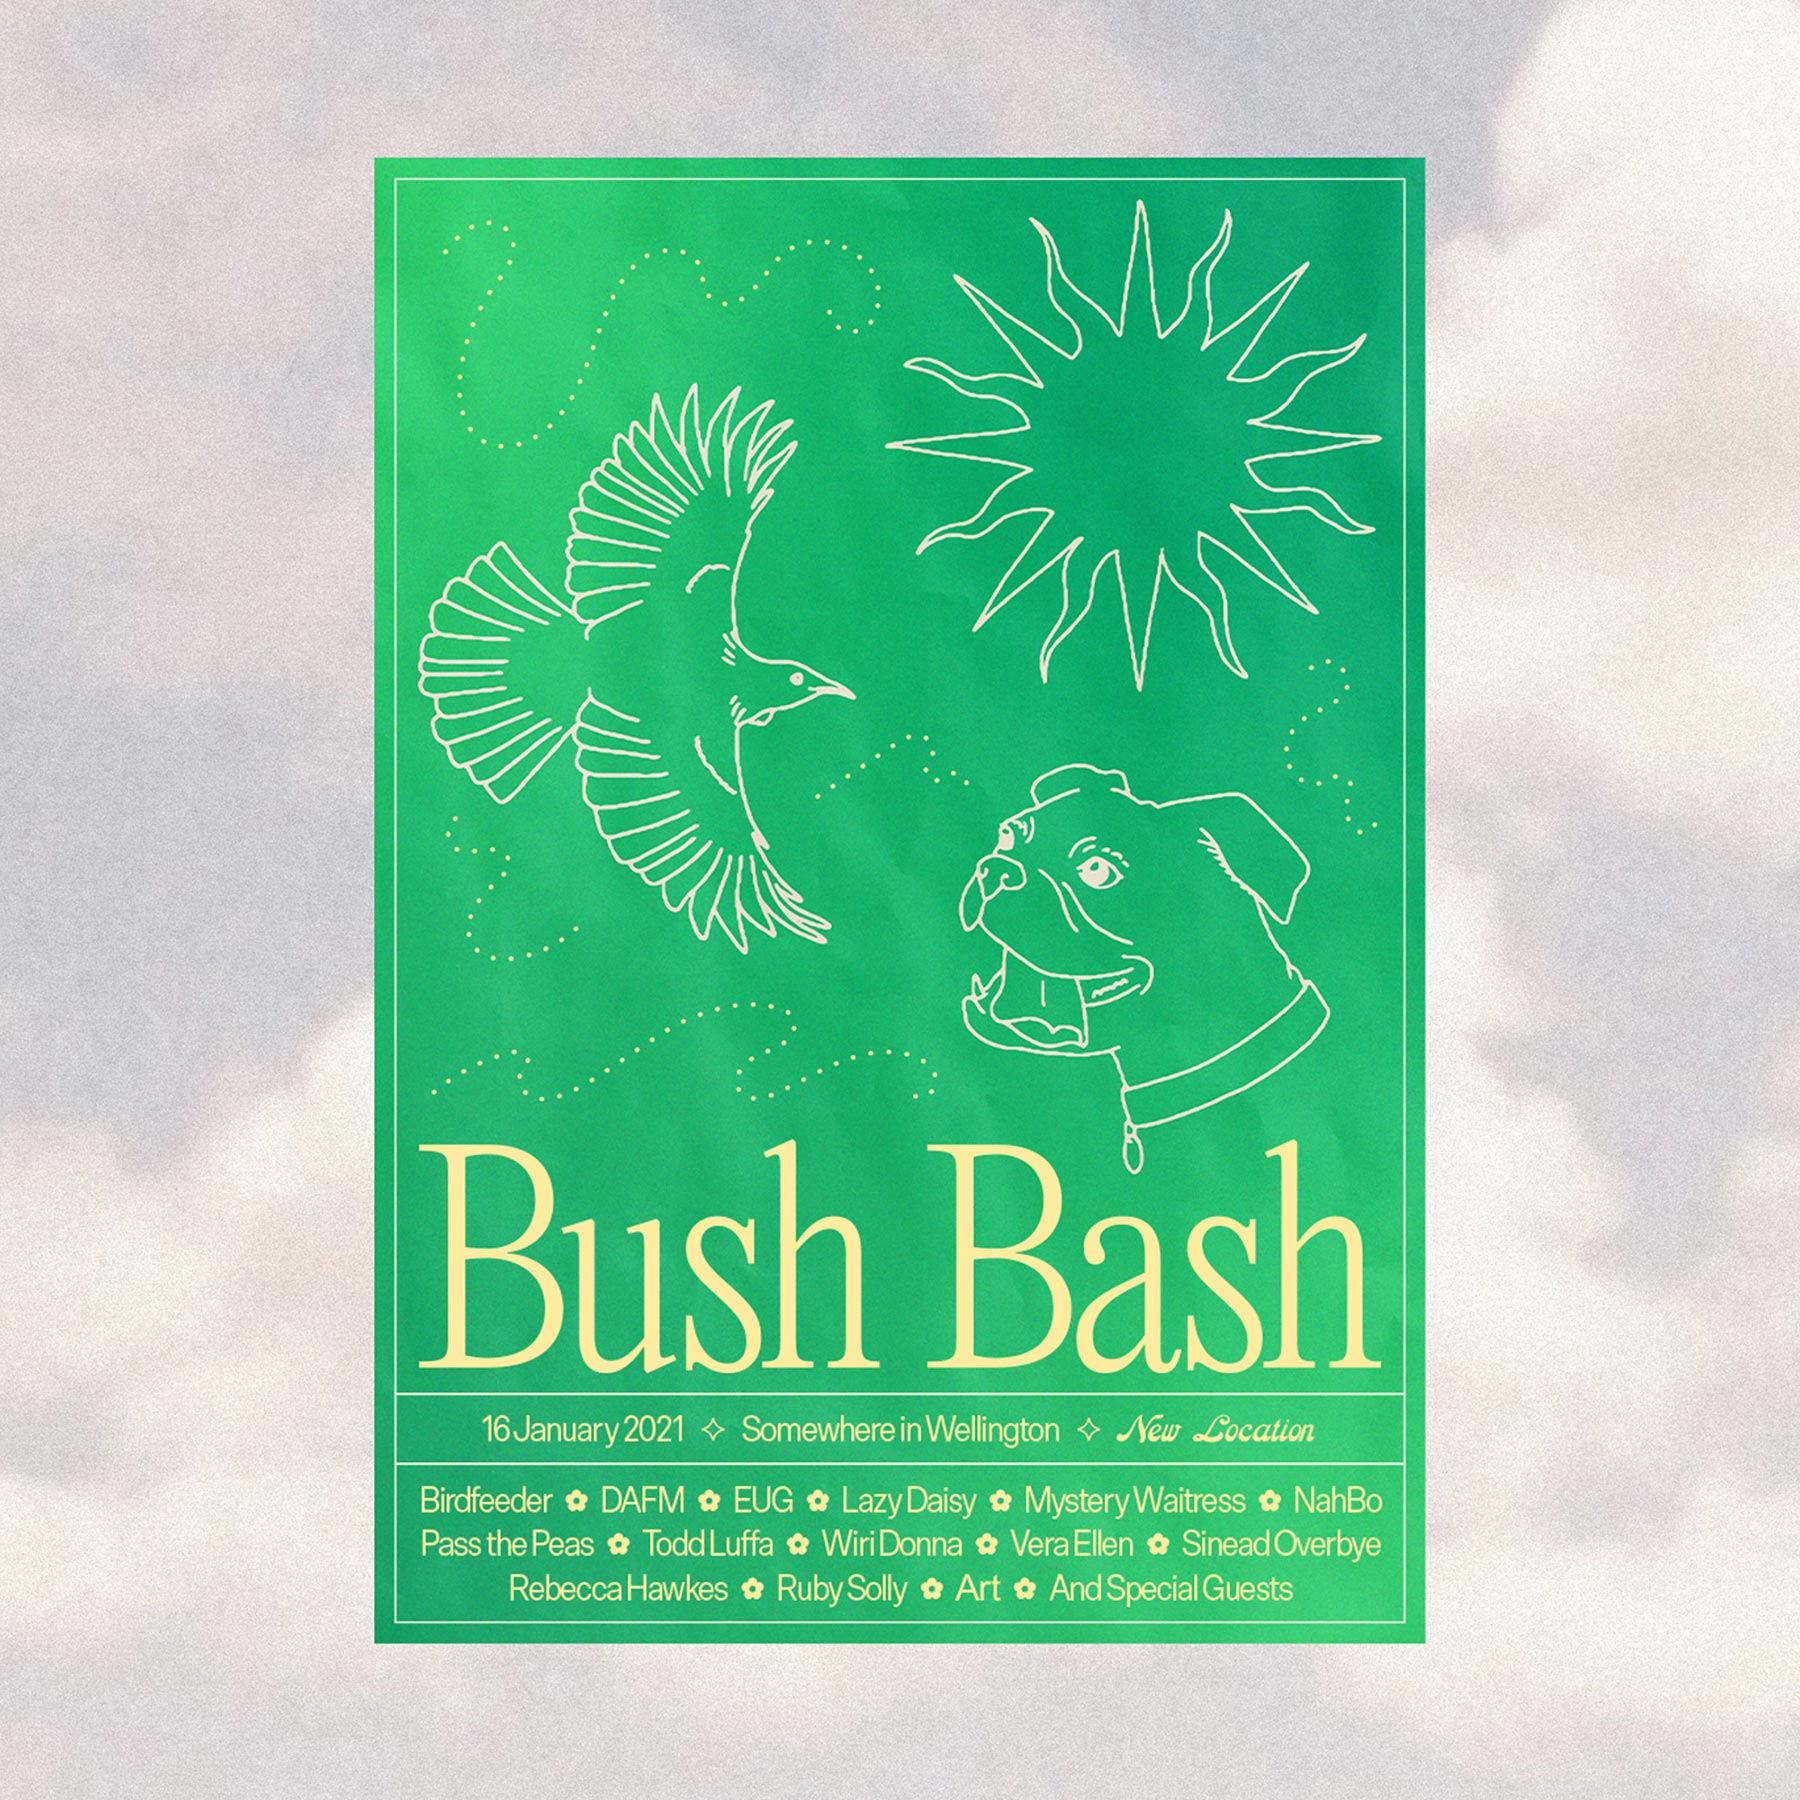 Bush Bash 2021 poster by ES